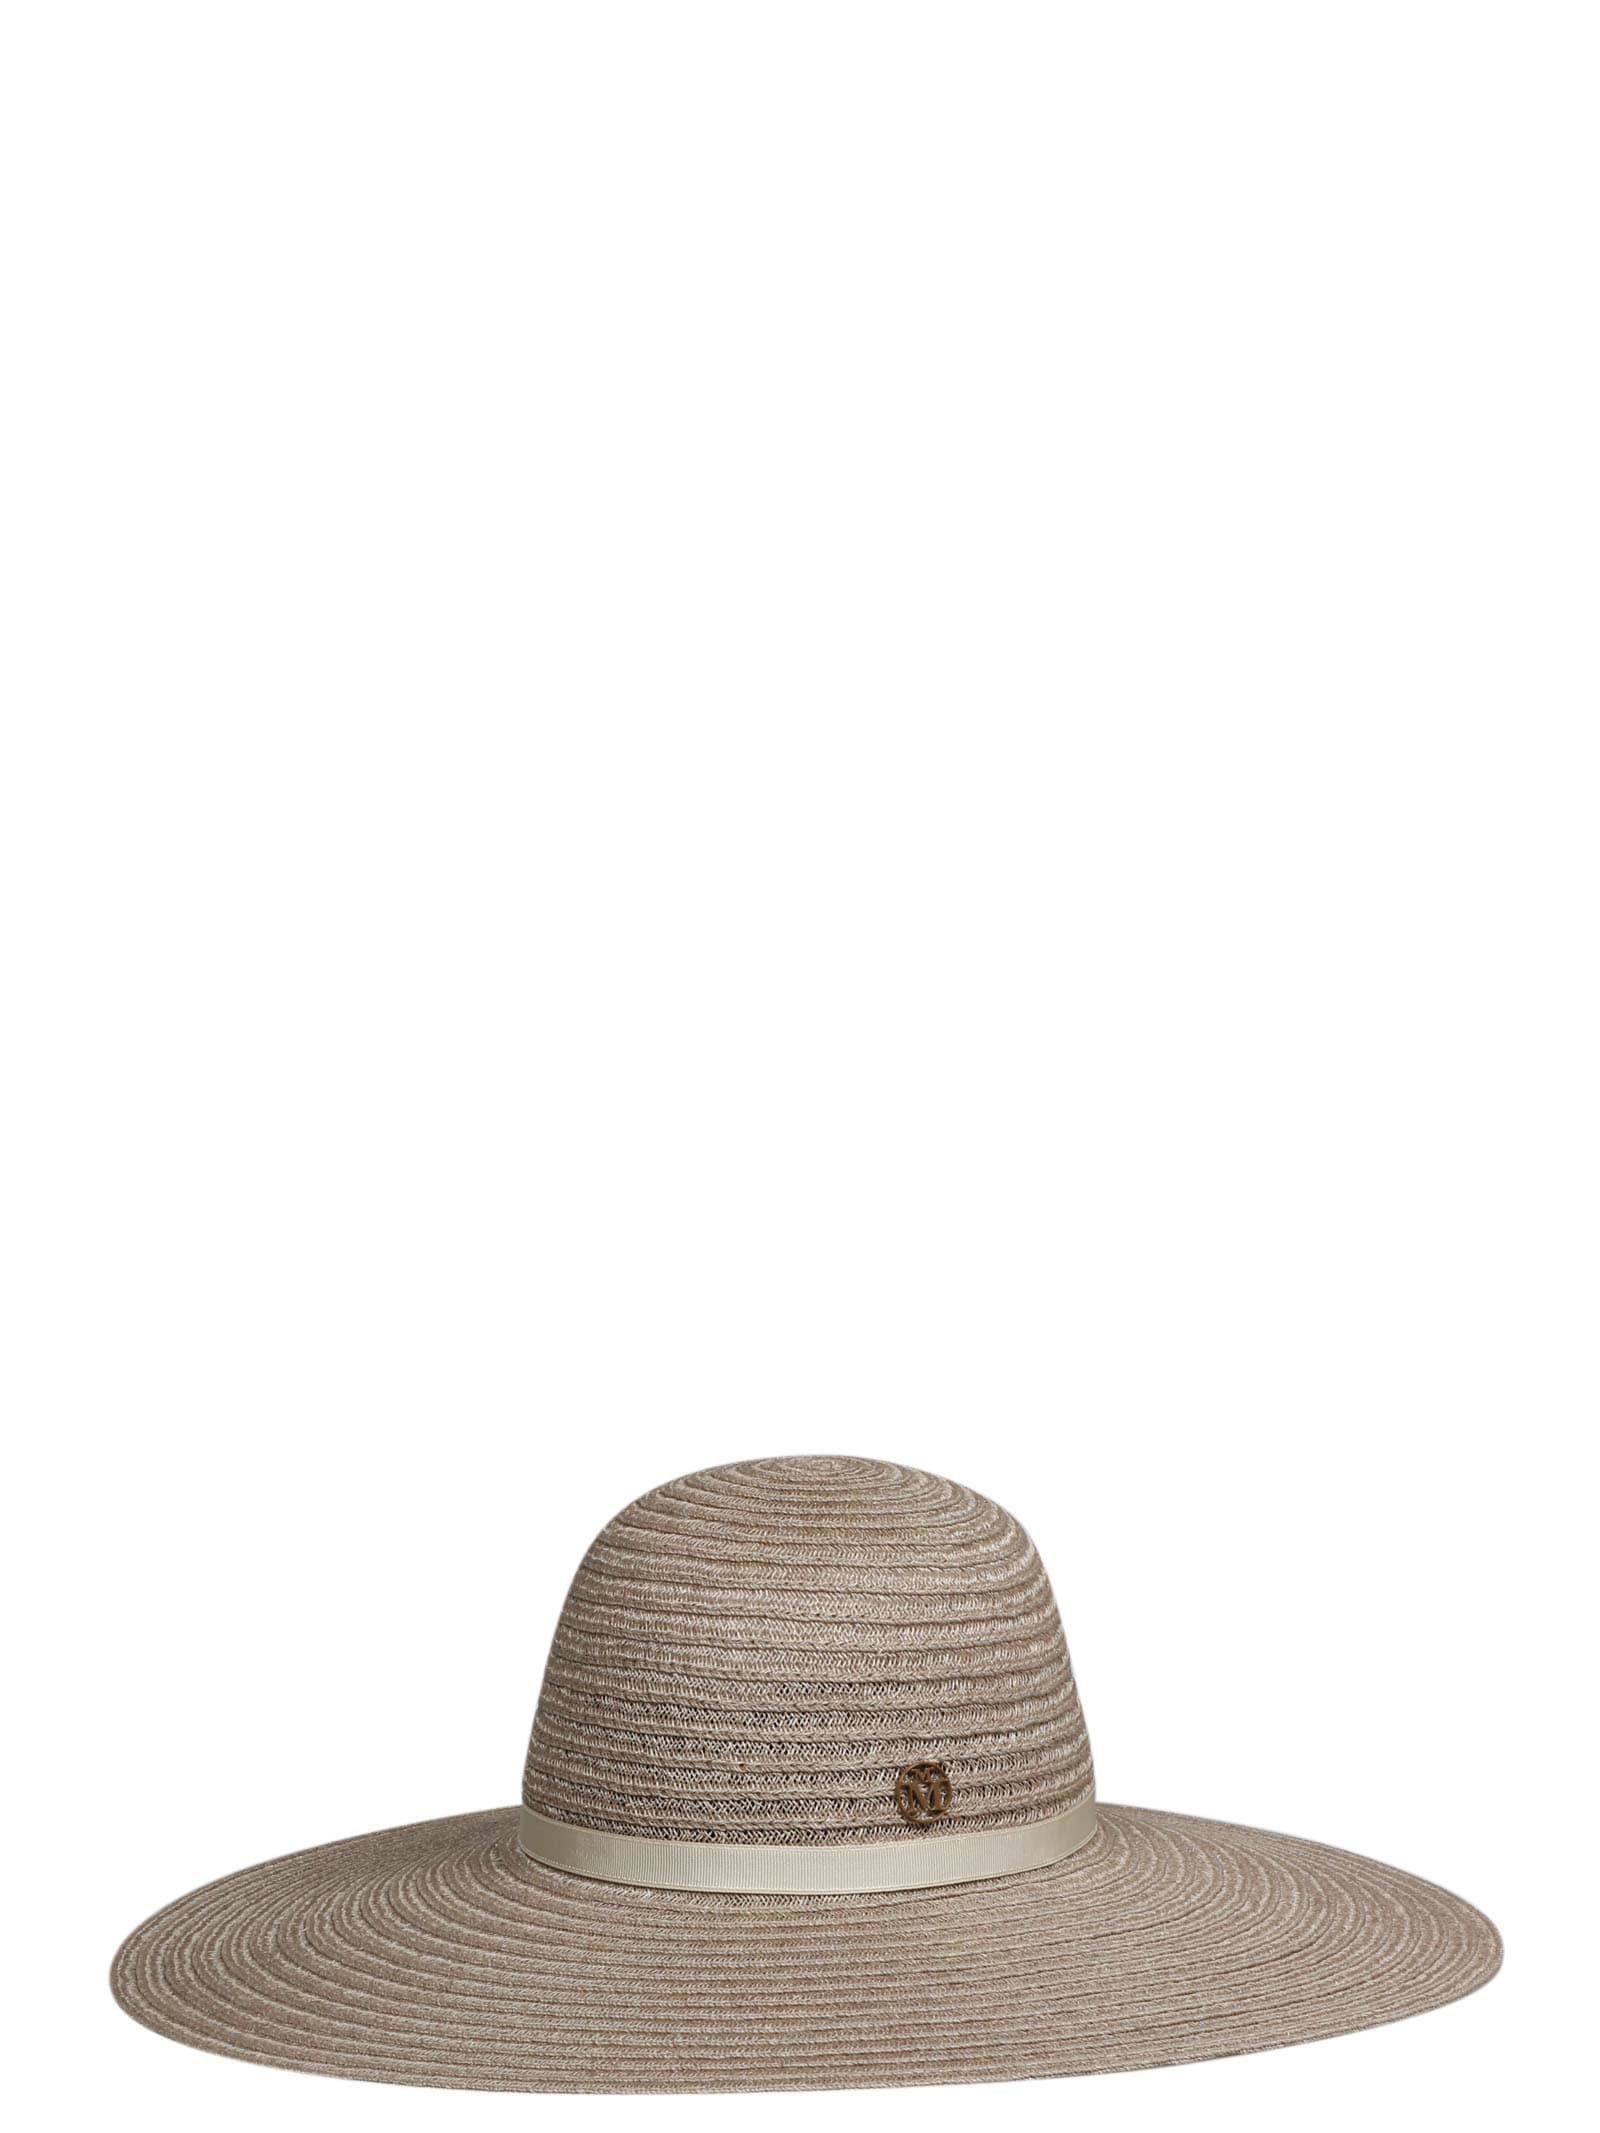 Maison Michel Blanche Hat